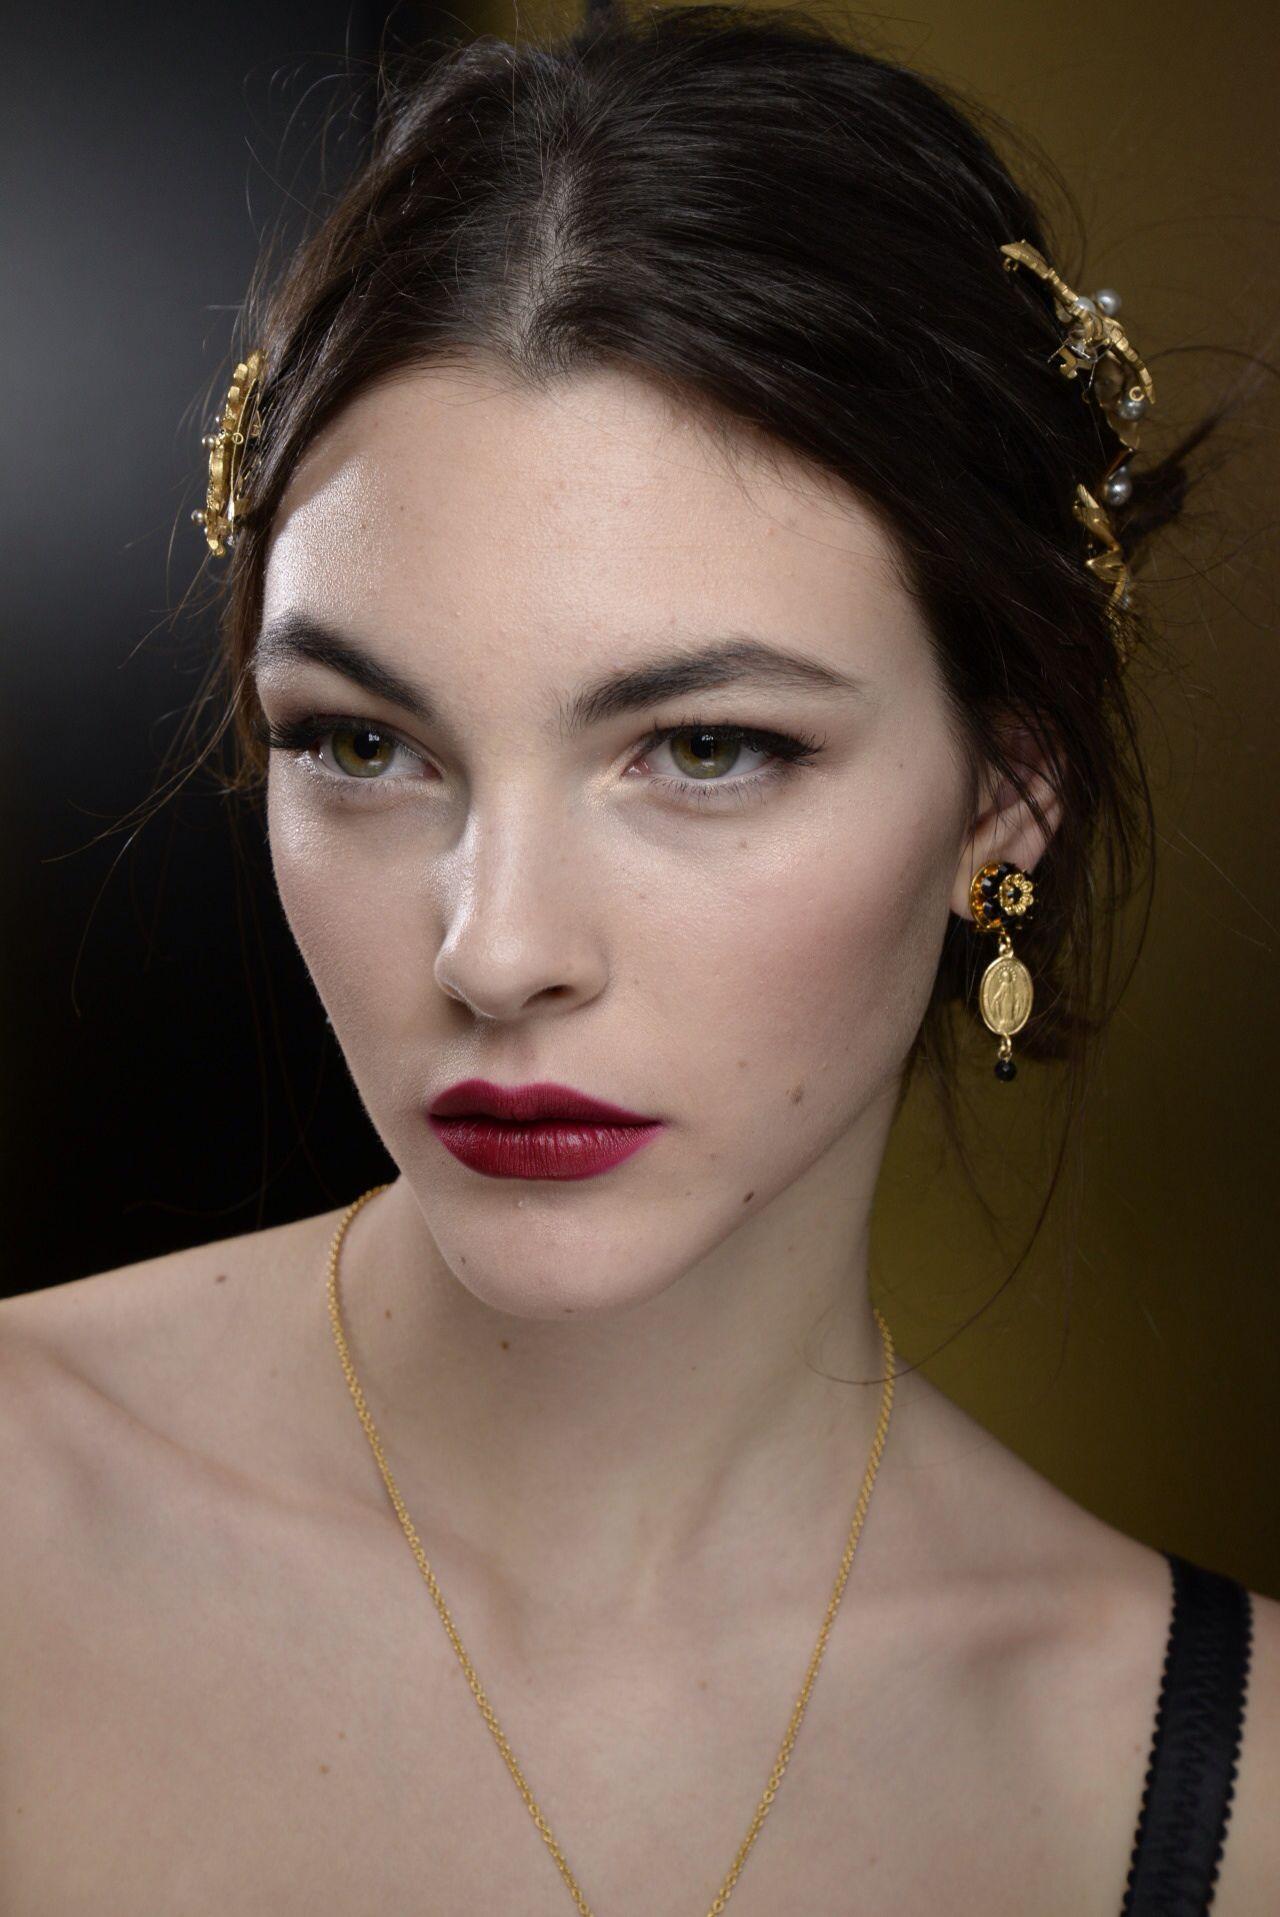 Dolce and Gabbana Fashion editorial makeup, Italian